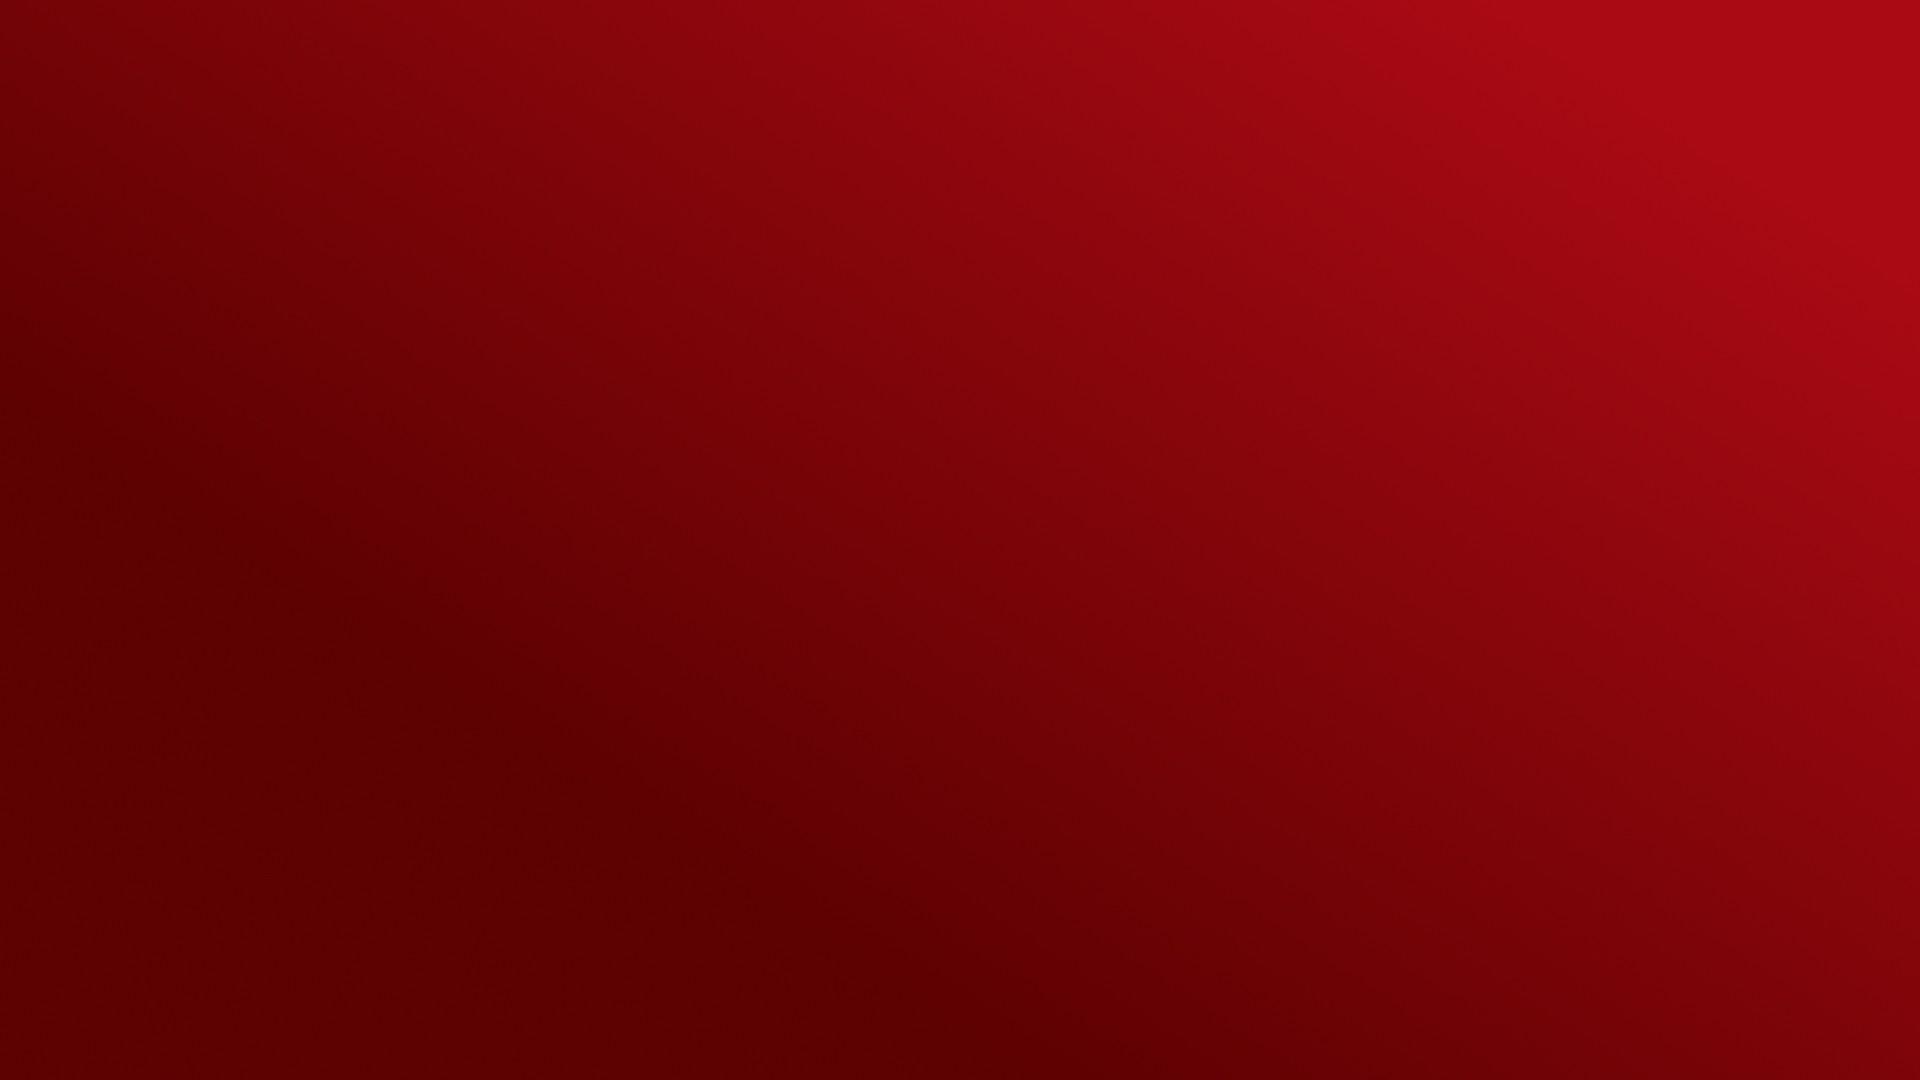 Simple red gradient wallpaper: